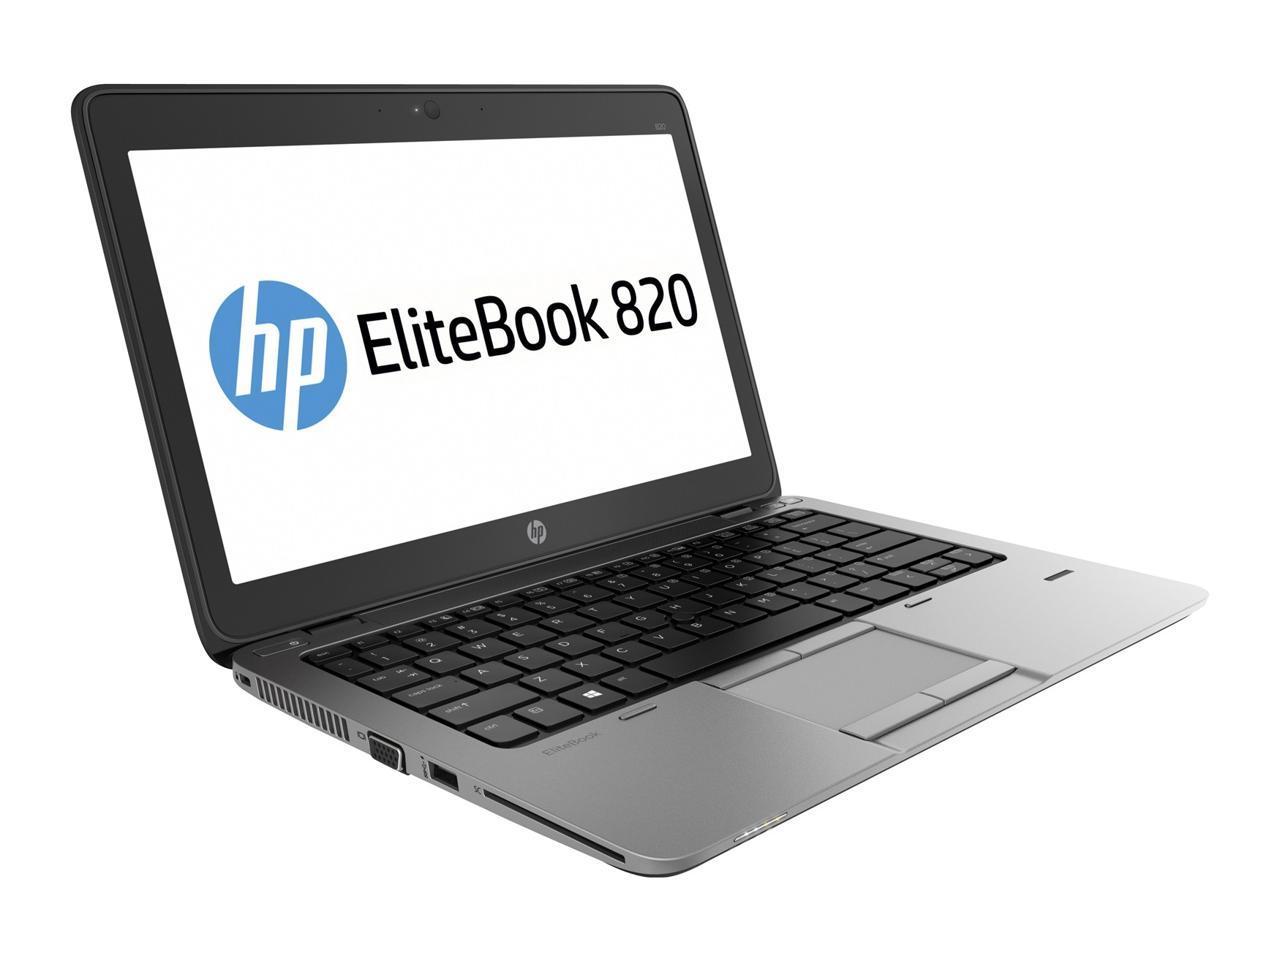 HP-Elitebook-820-G2-Laptop-Intel-Core-i5-2-3GHz-8GB-Ram-180GB-SSD-Windows-10-P thumbnail 2